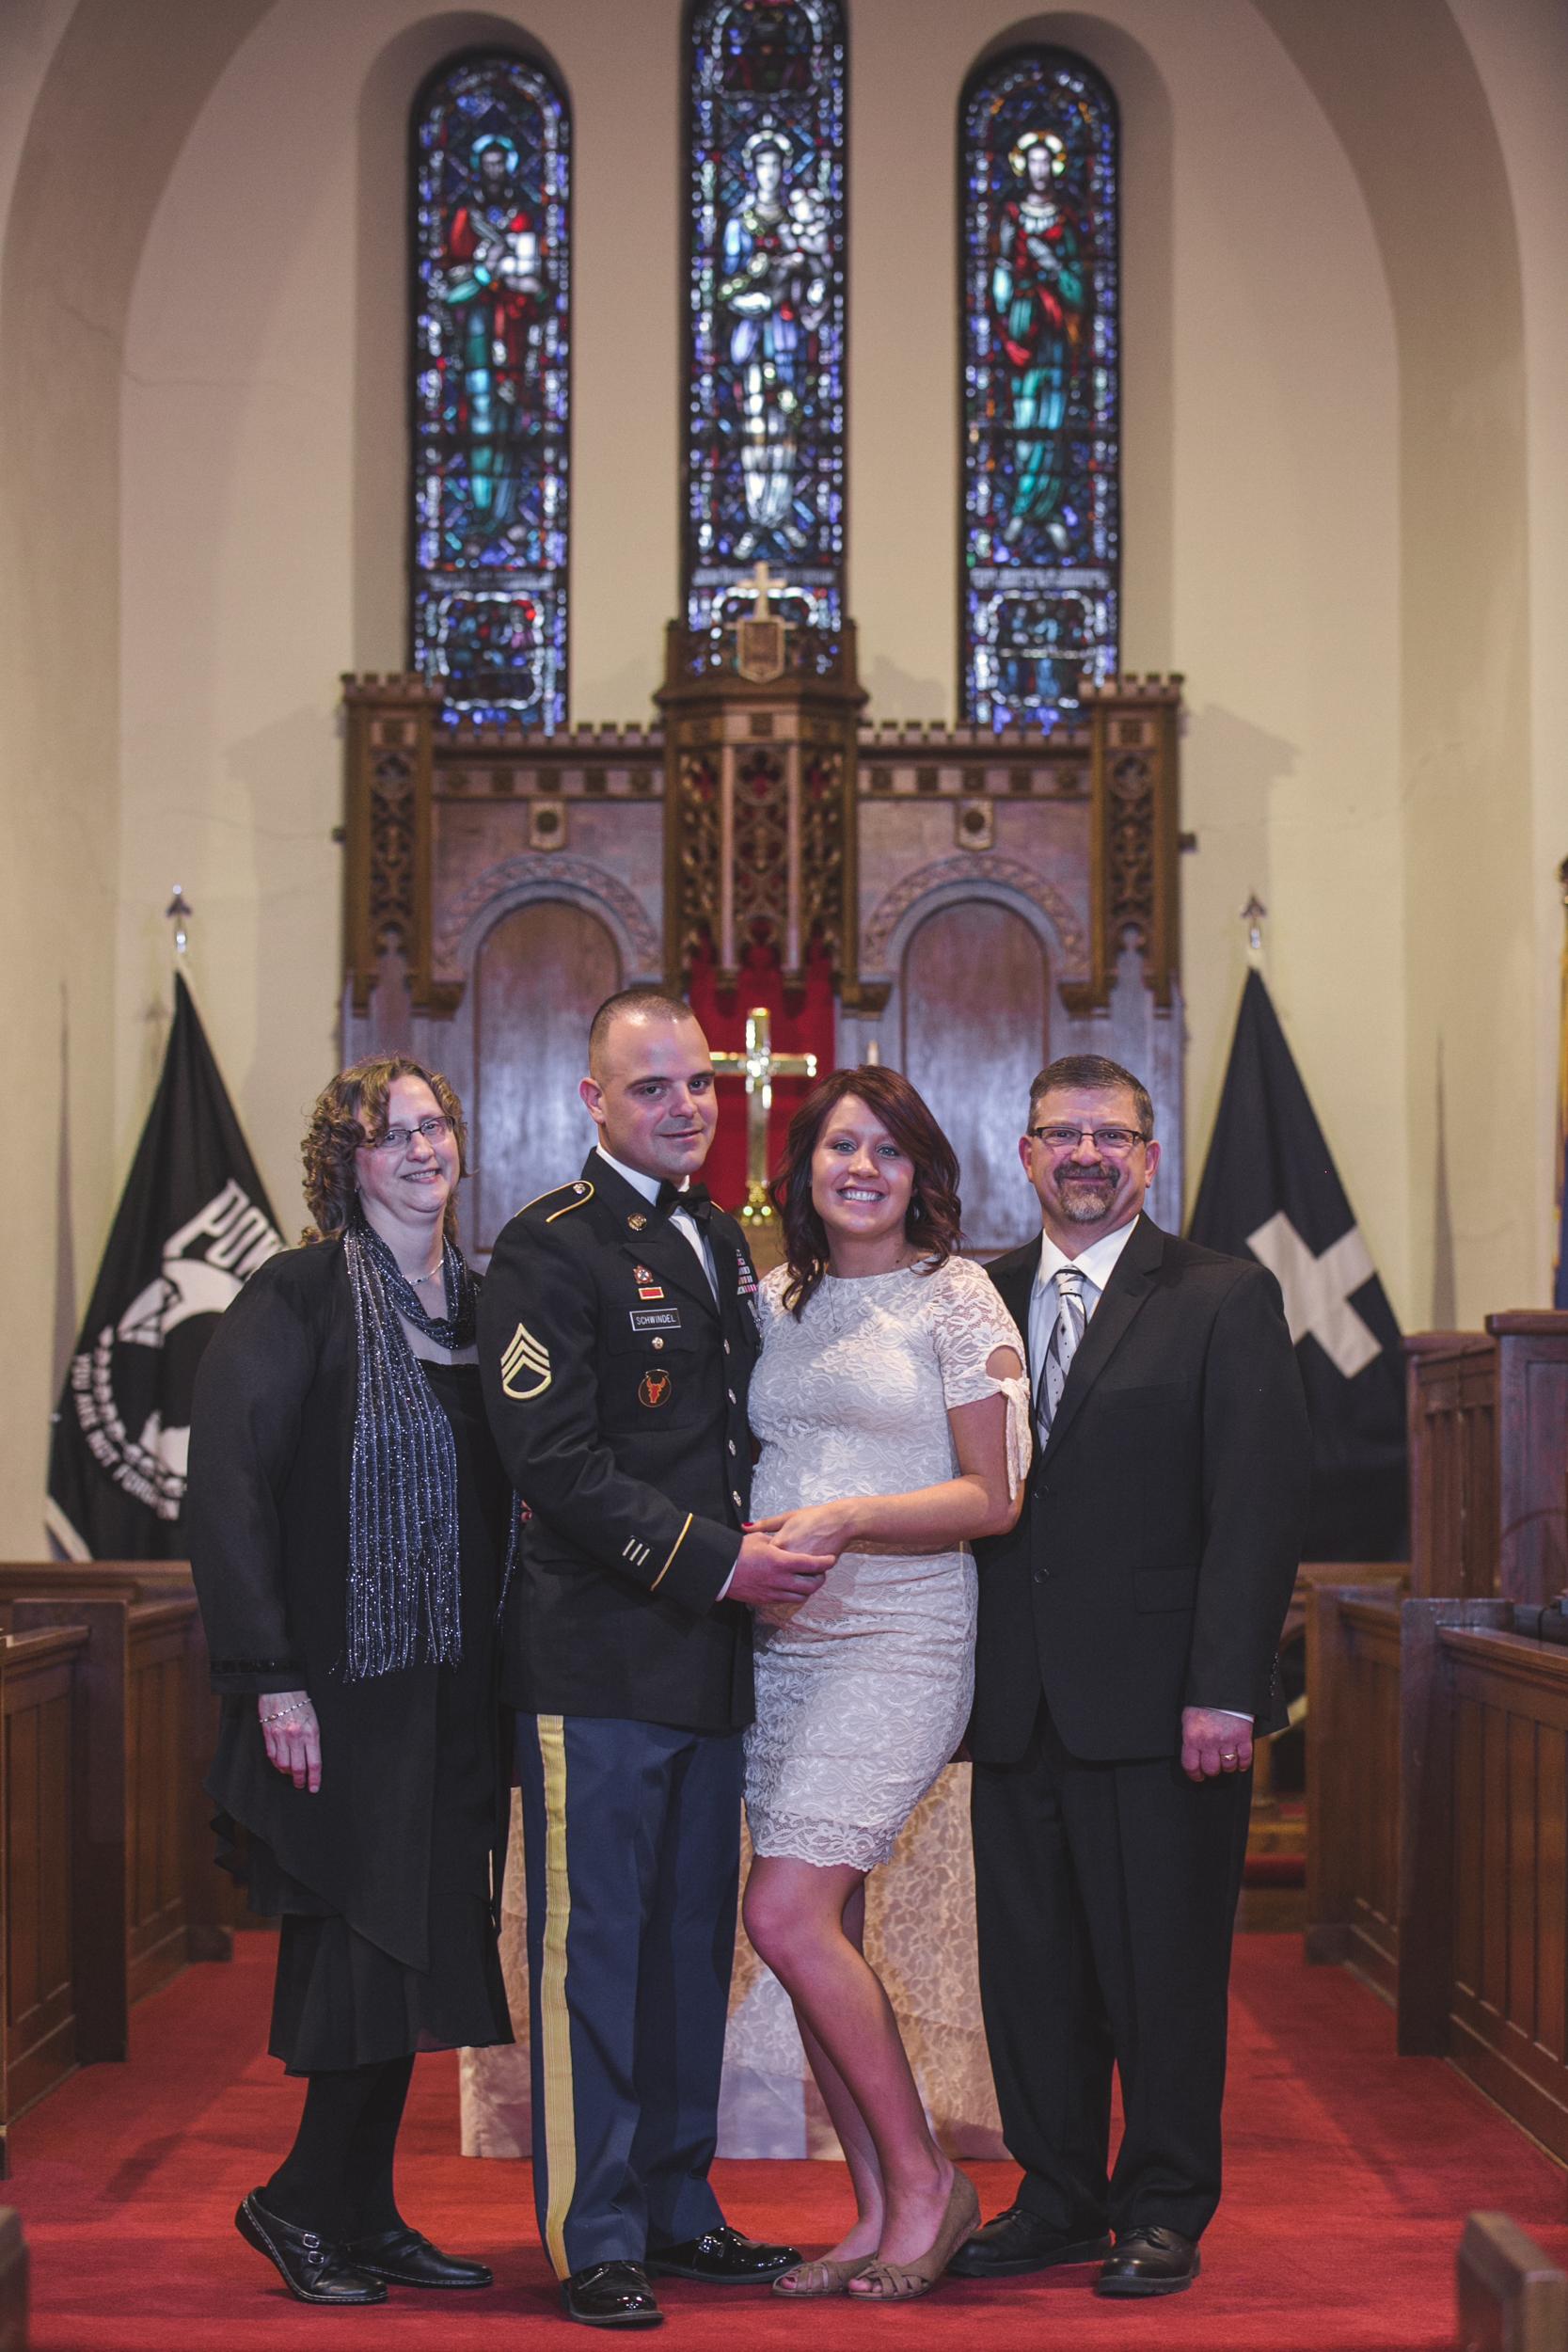 Fort Snelling Elopement St. Paul, MN, Fort Snelling Elopement, Military Elopement, Intimate Military Wedding, intimate elopement wedding-www.rachelsmak.com35.jpg